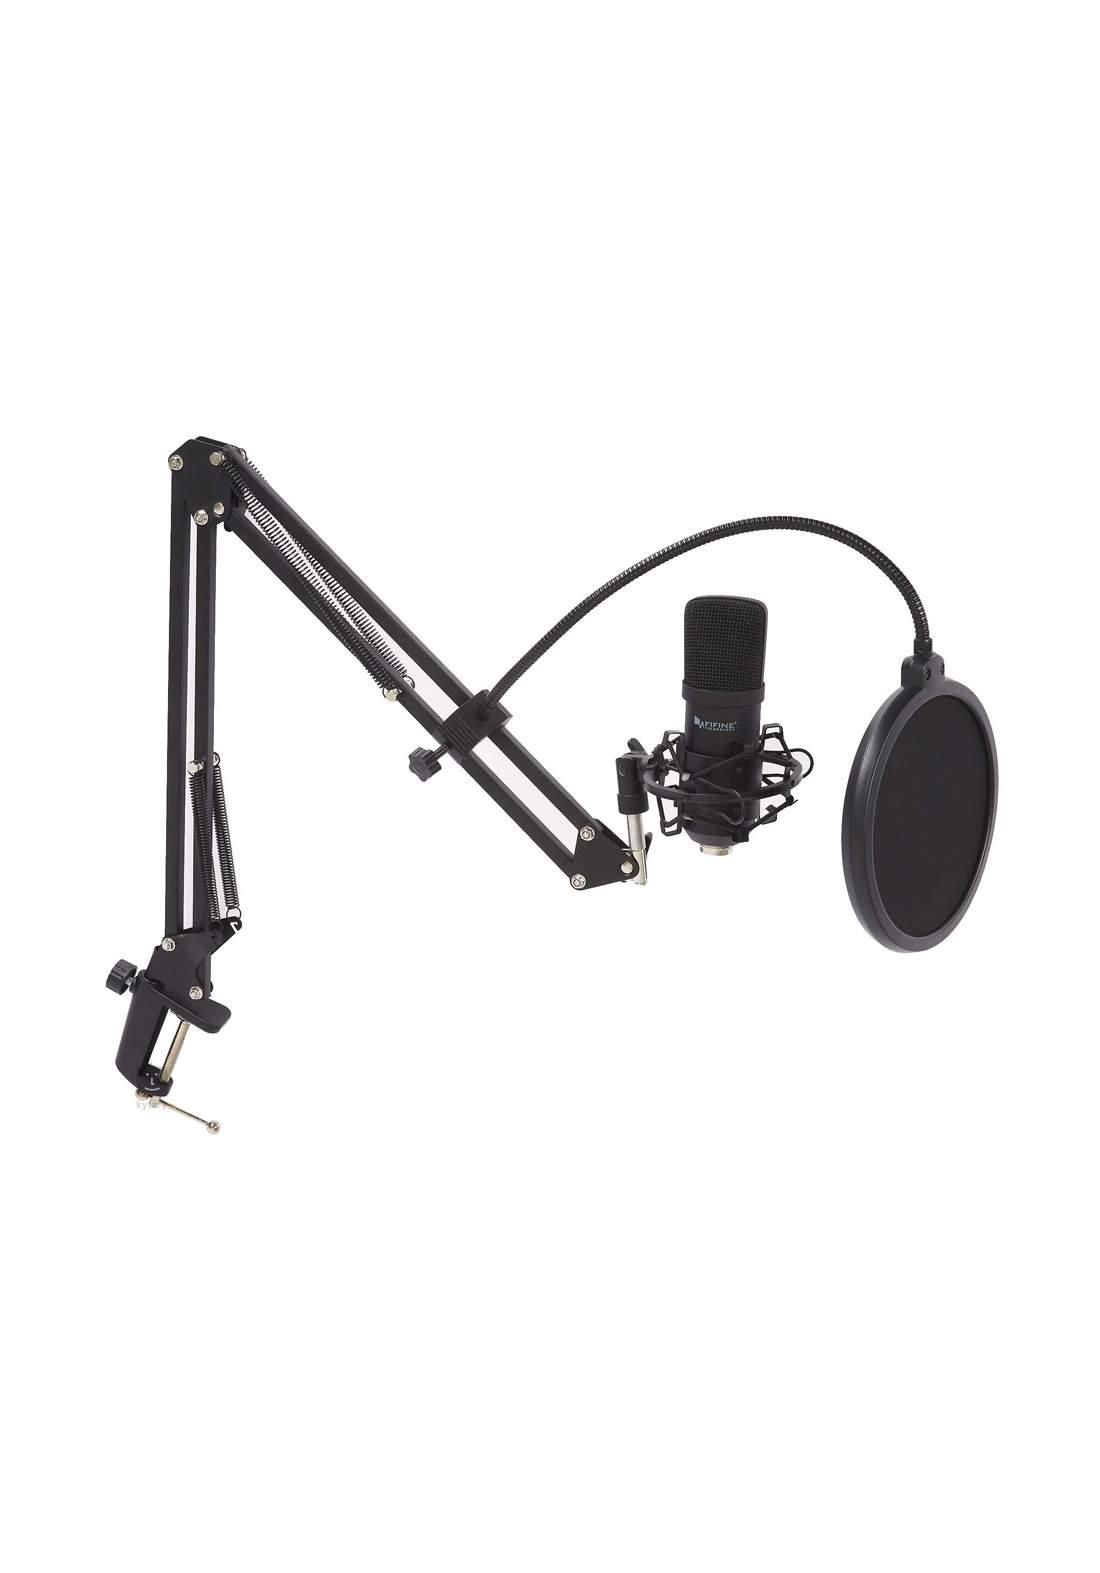 Fifine T730 USB Condenser Microphone - Black مايكروفون